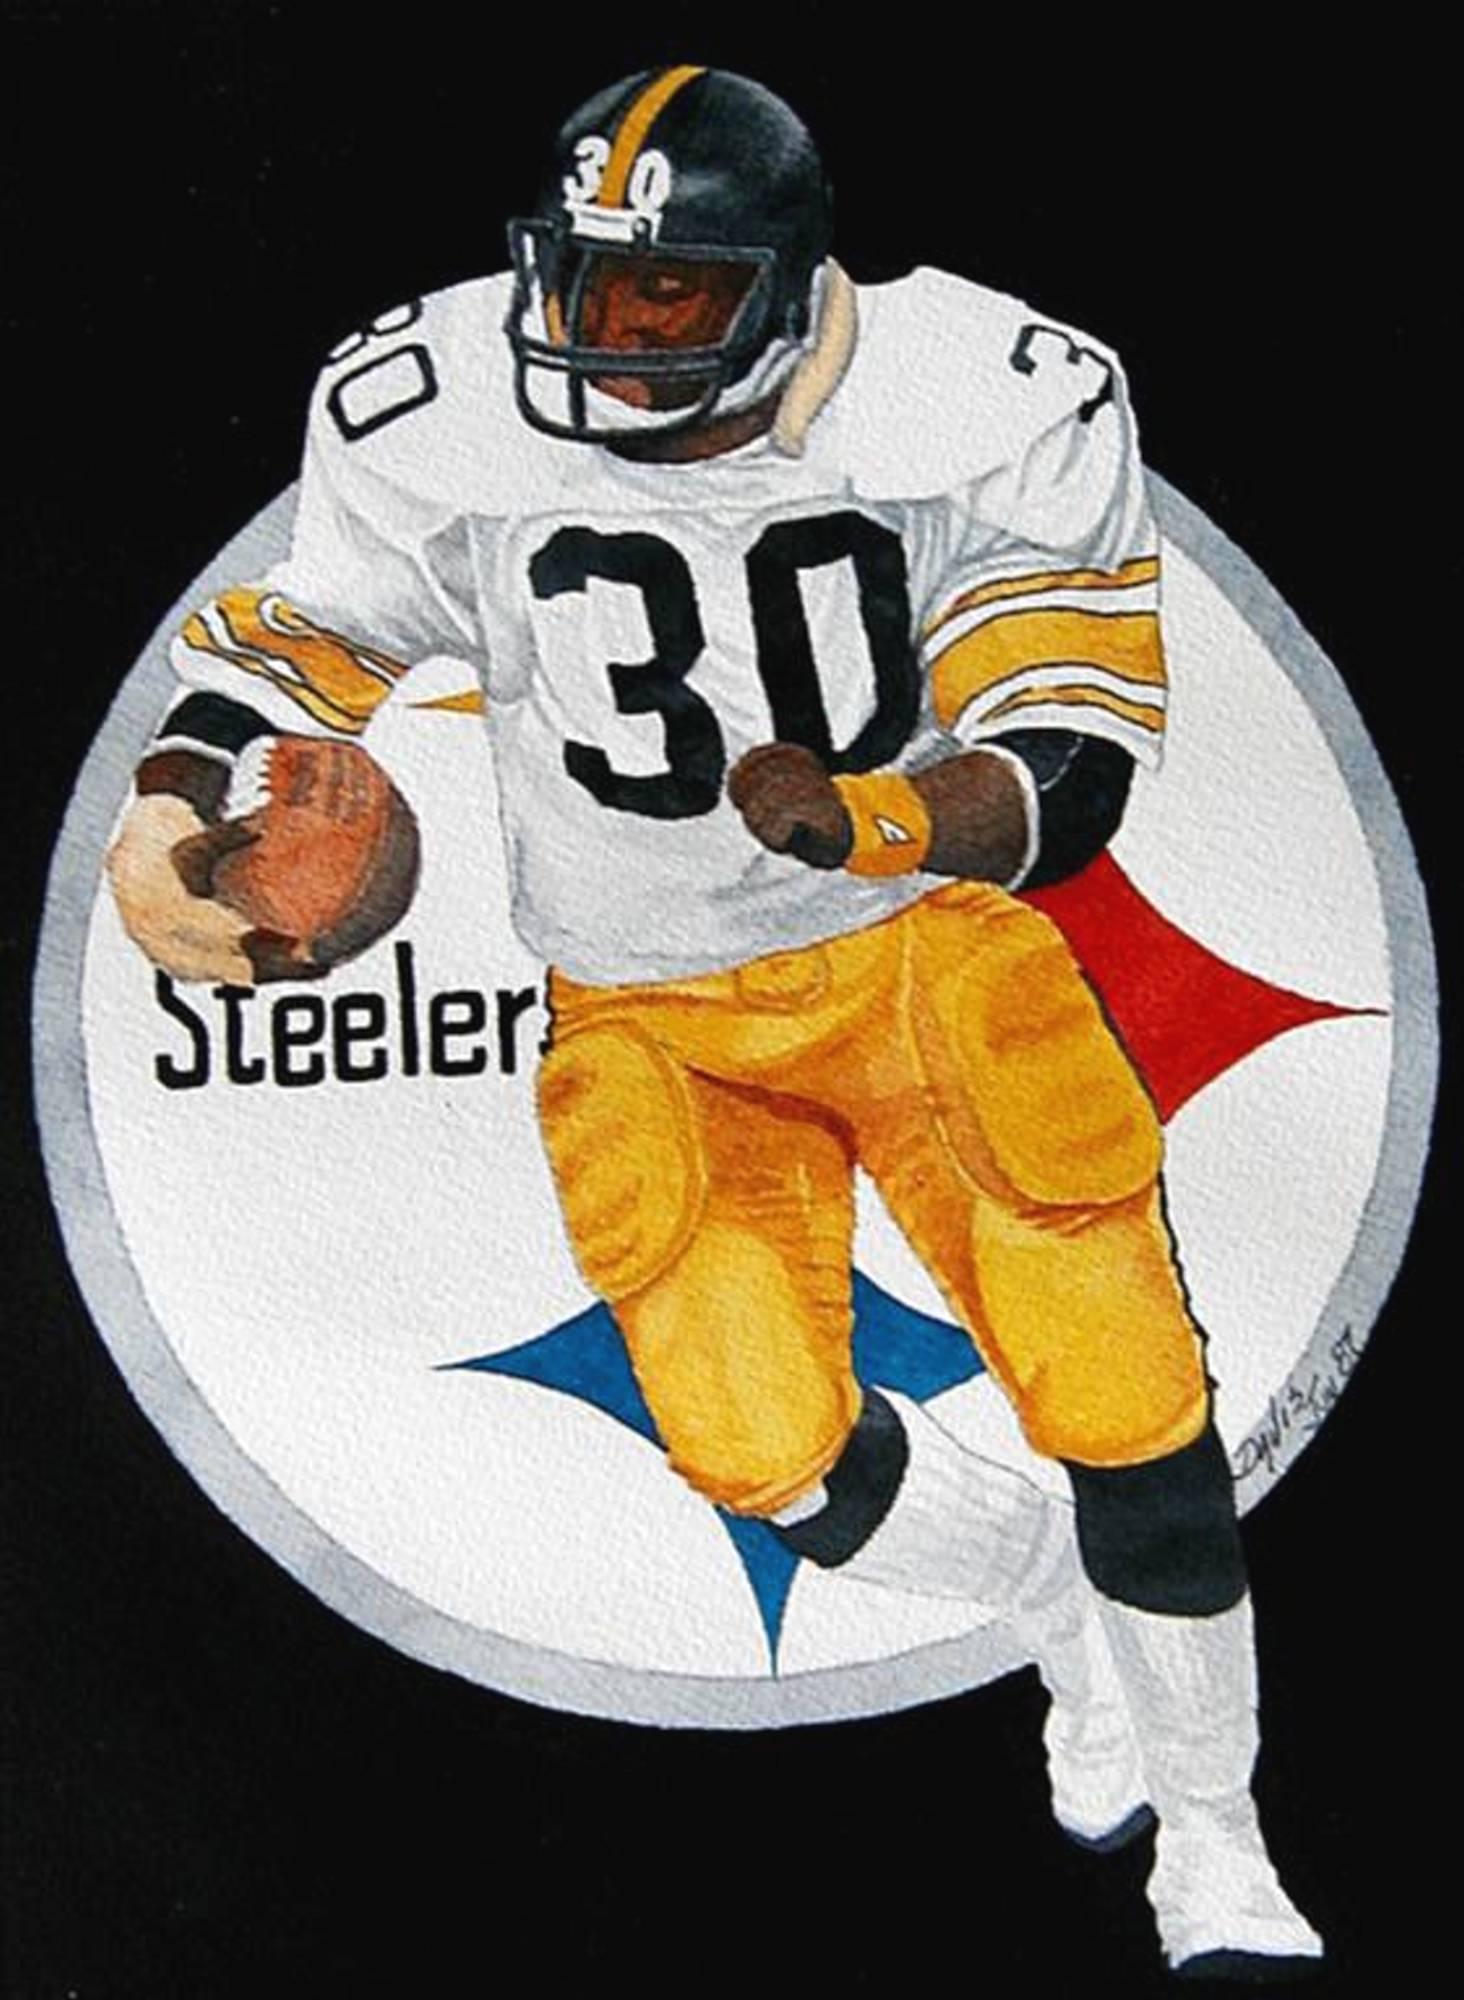 Steelers running back